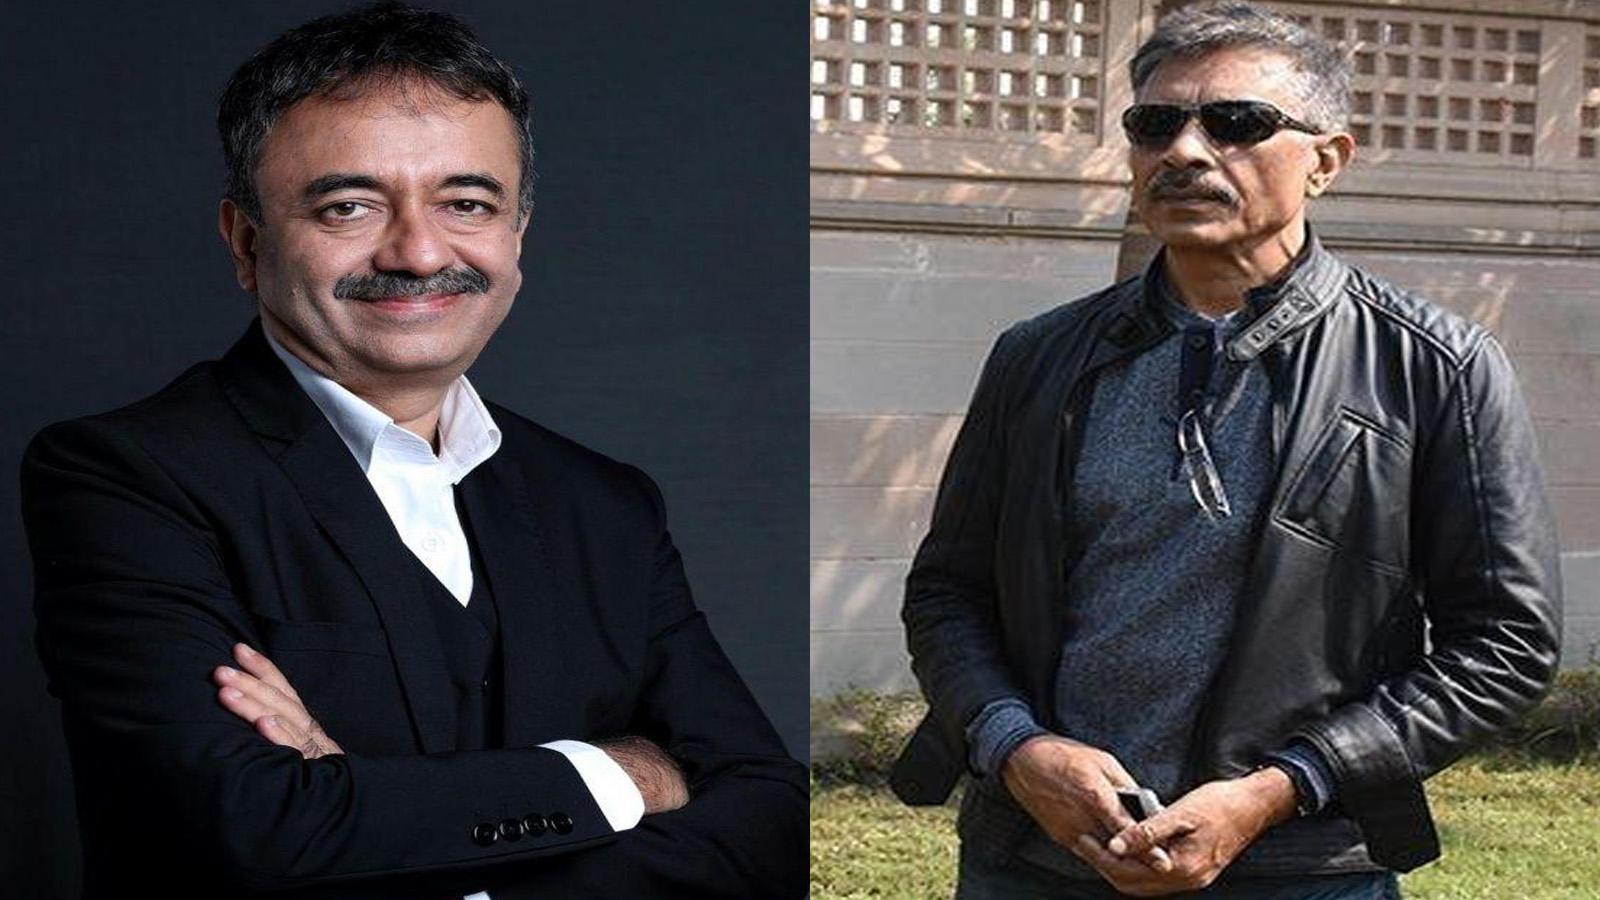 Prakash Jha reacts to #MeToo allegations against Rajkumar Hirani